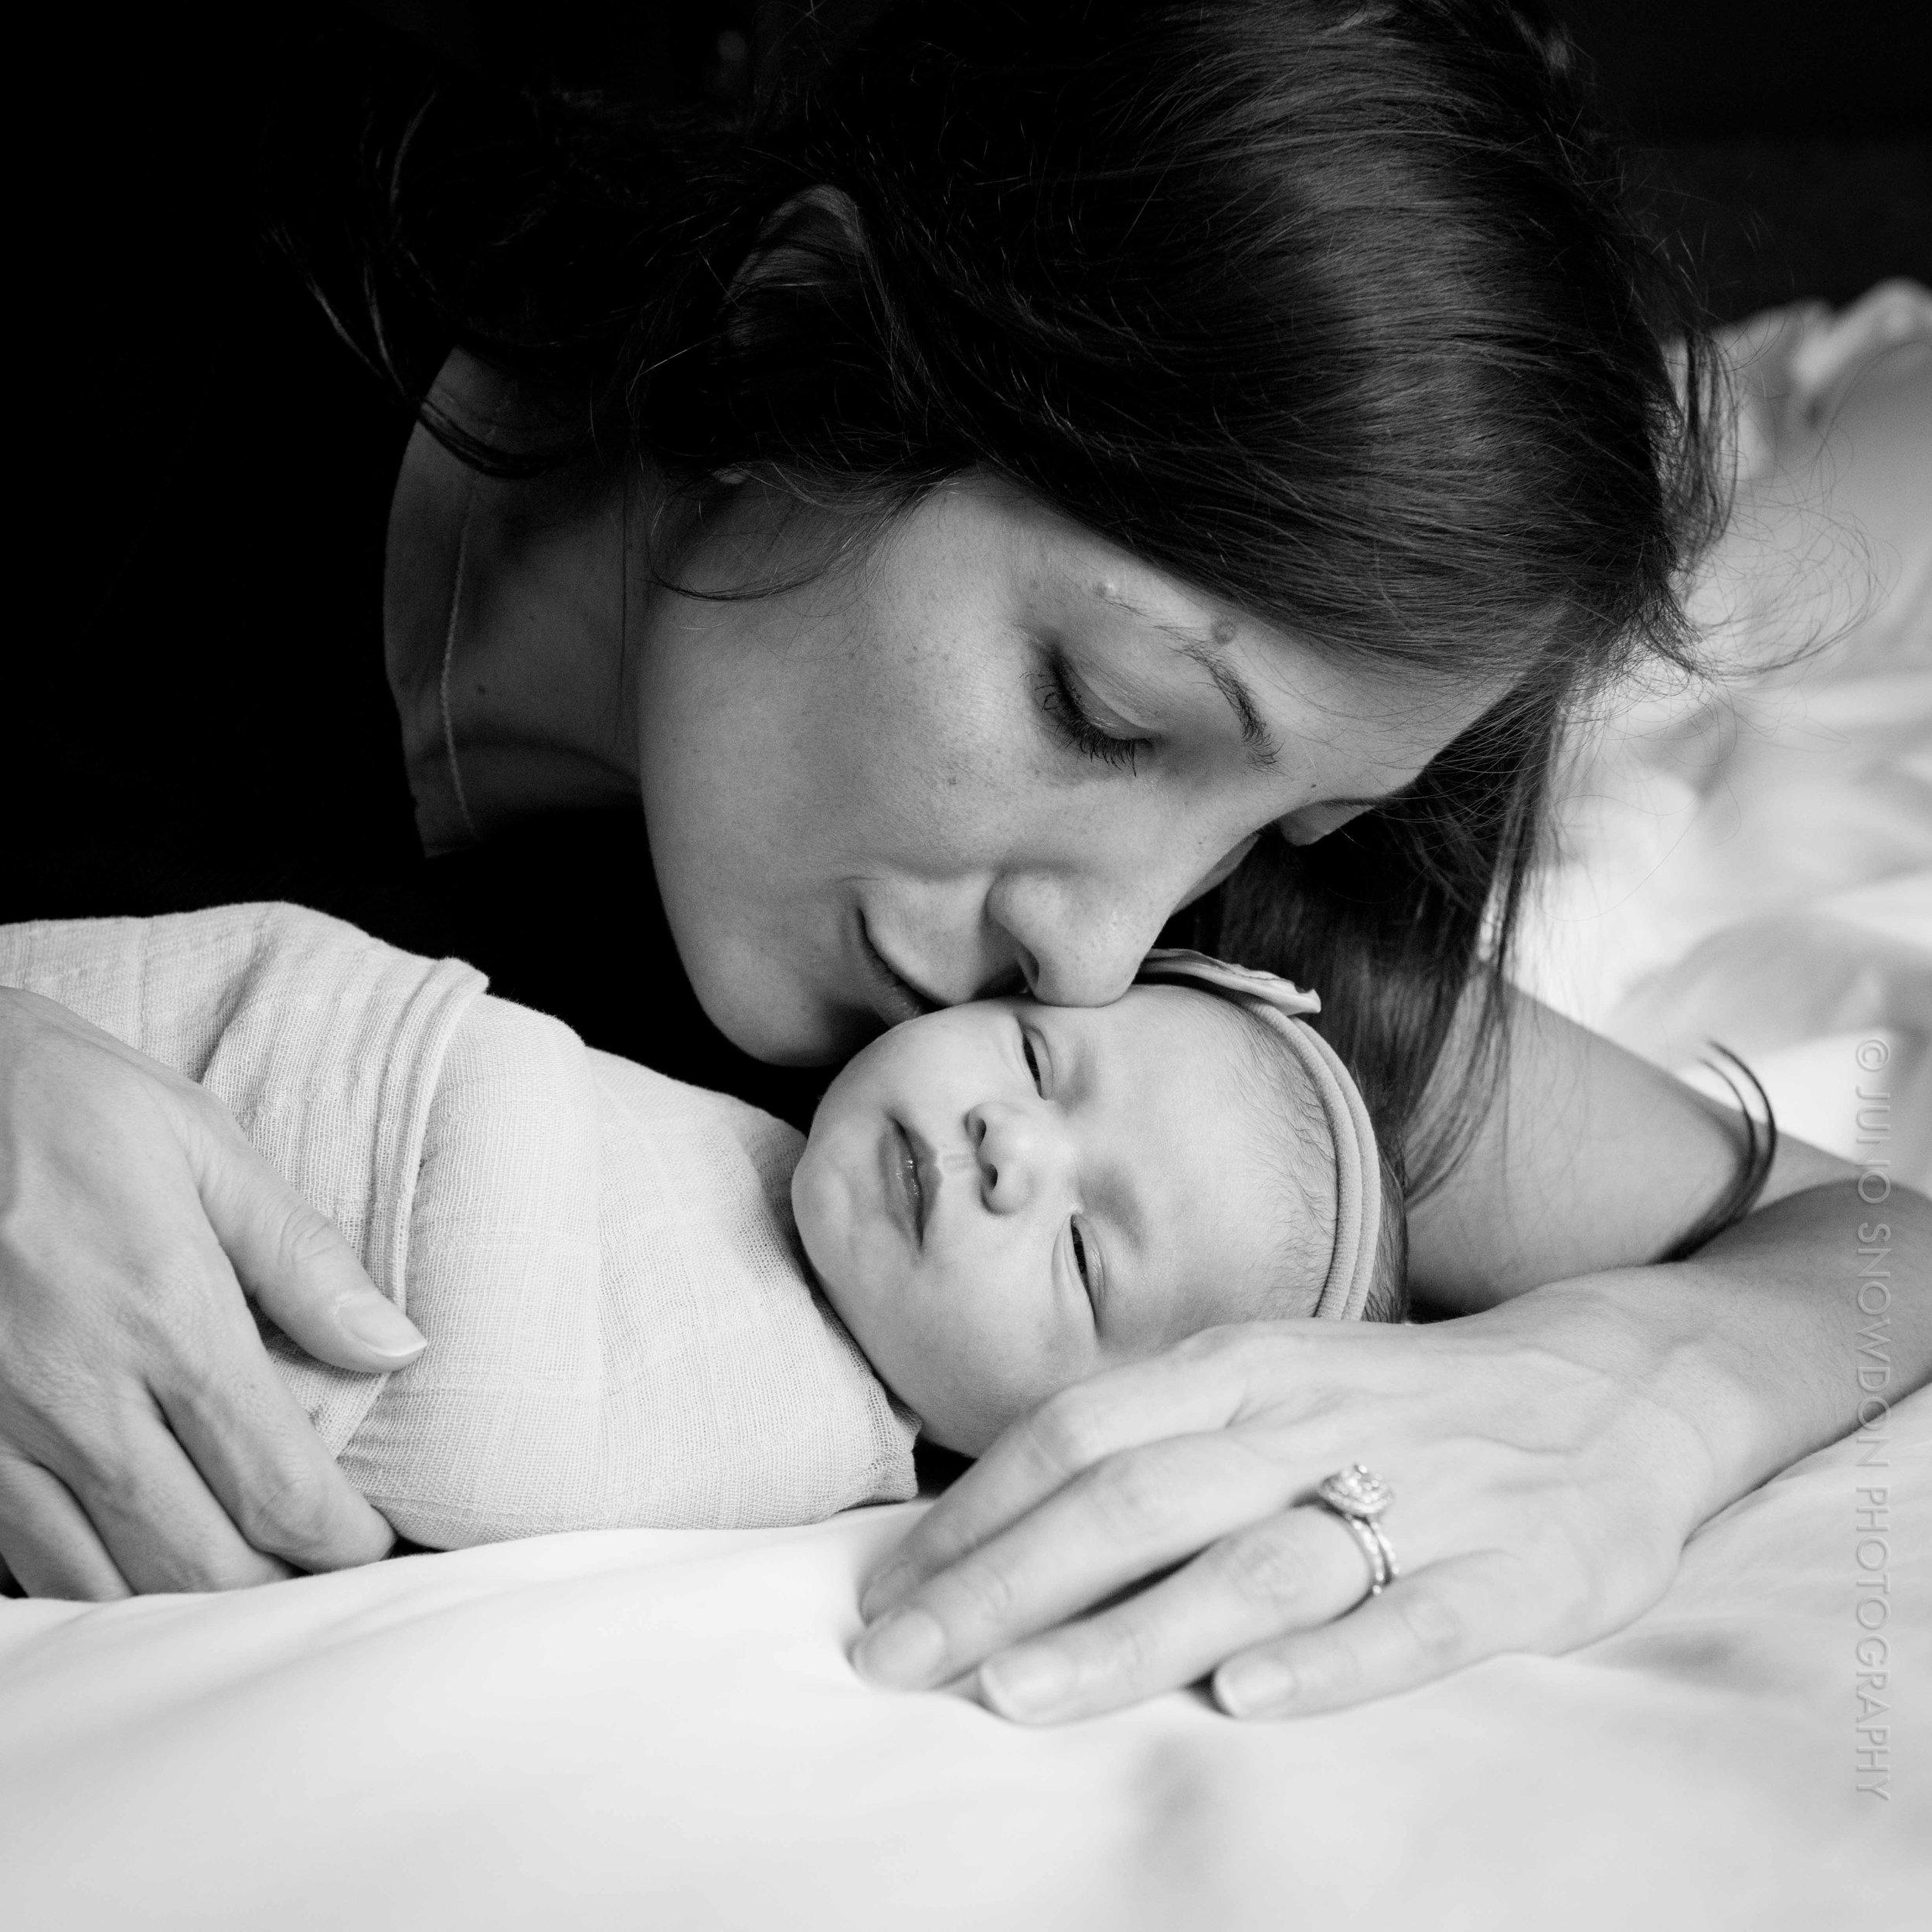 juno-snowdon-photography-newborn-portrait-7373.jpg